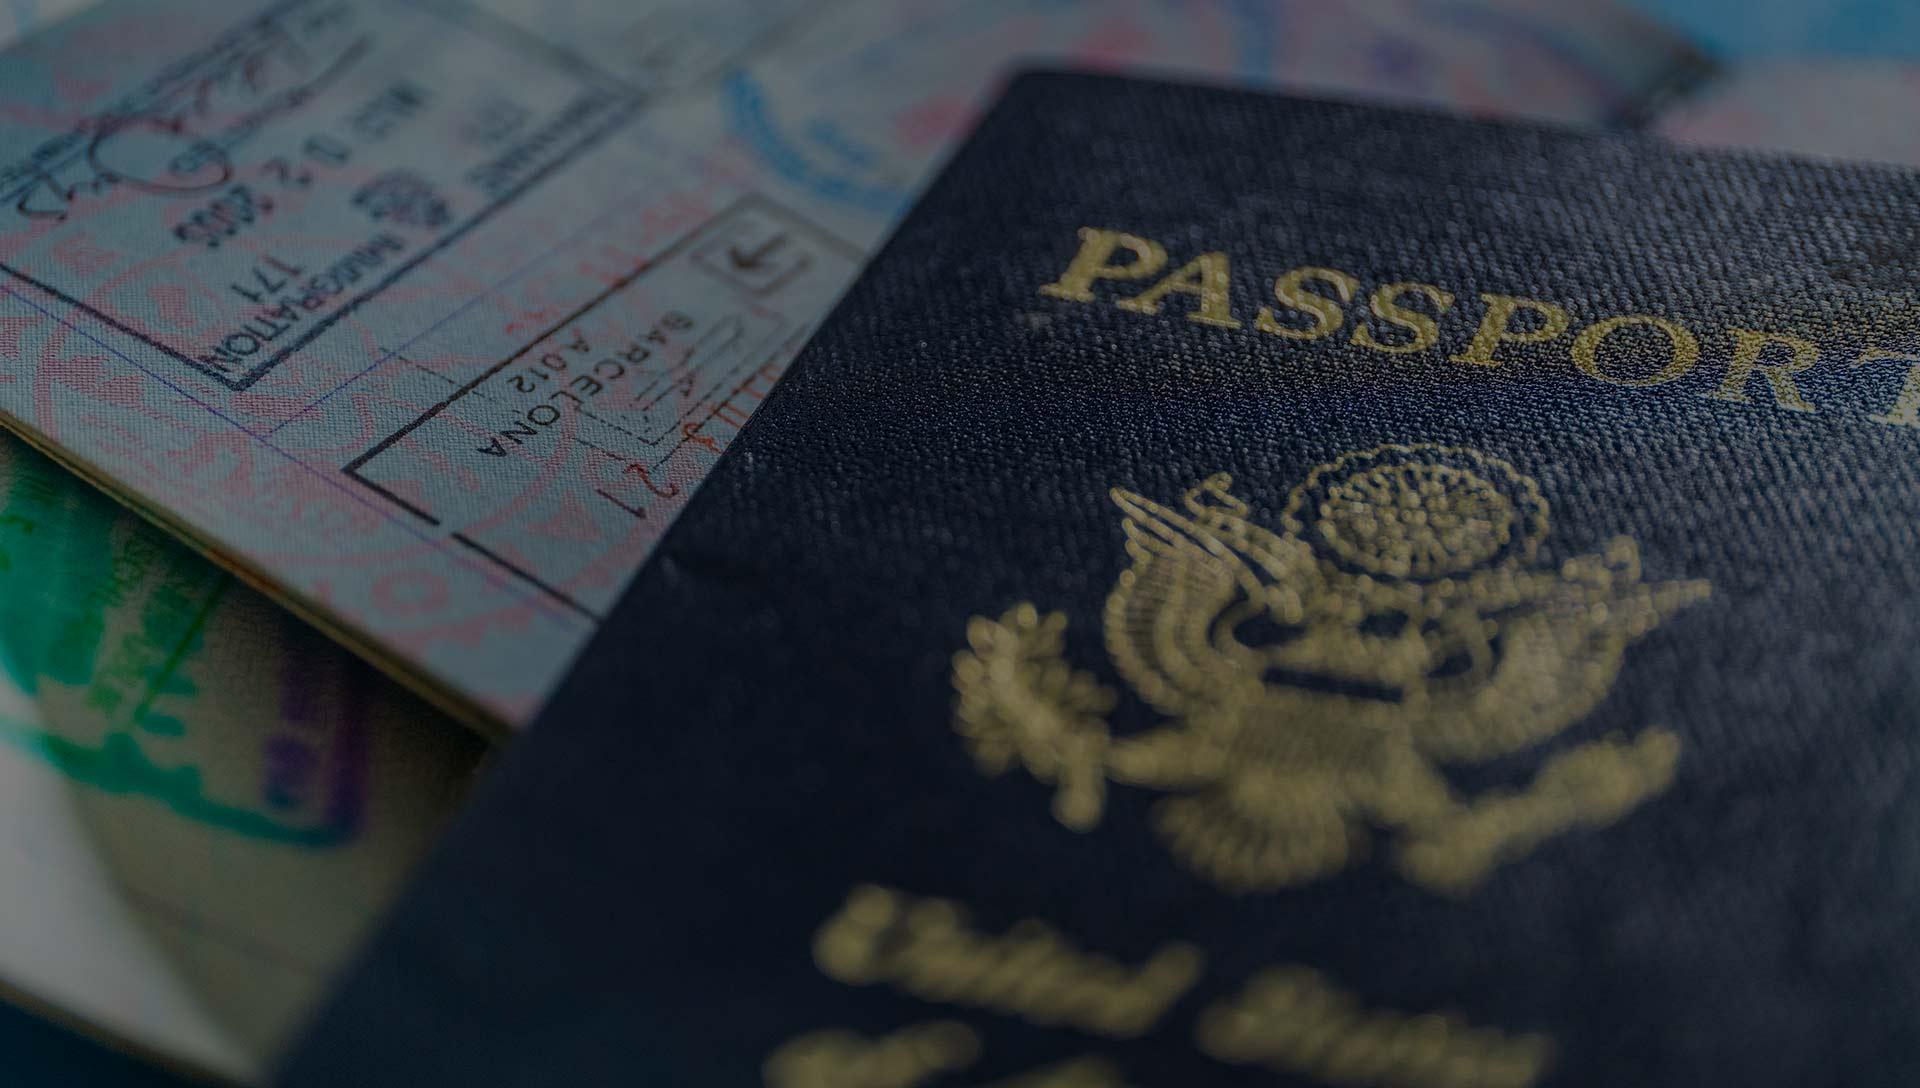 A passport and passport stamps.